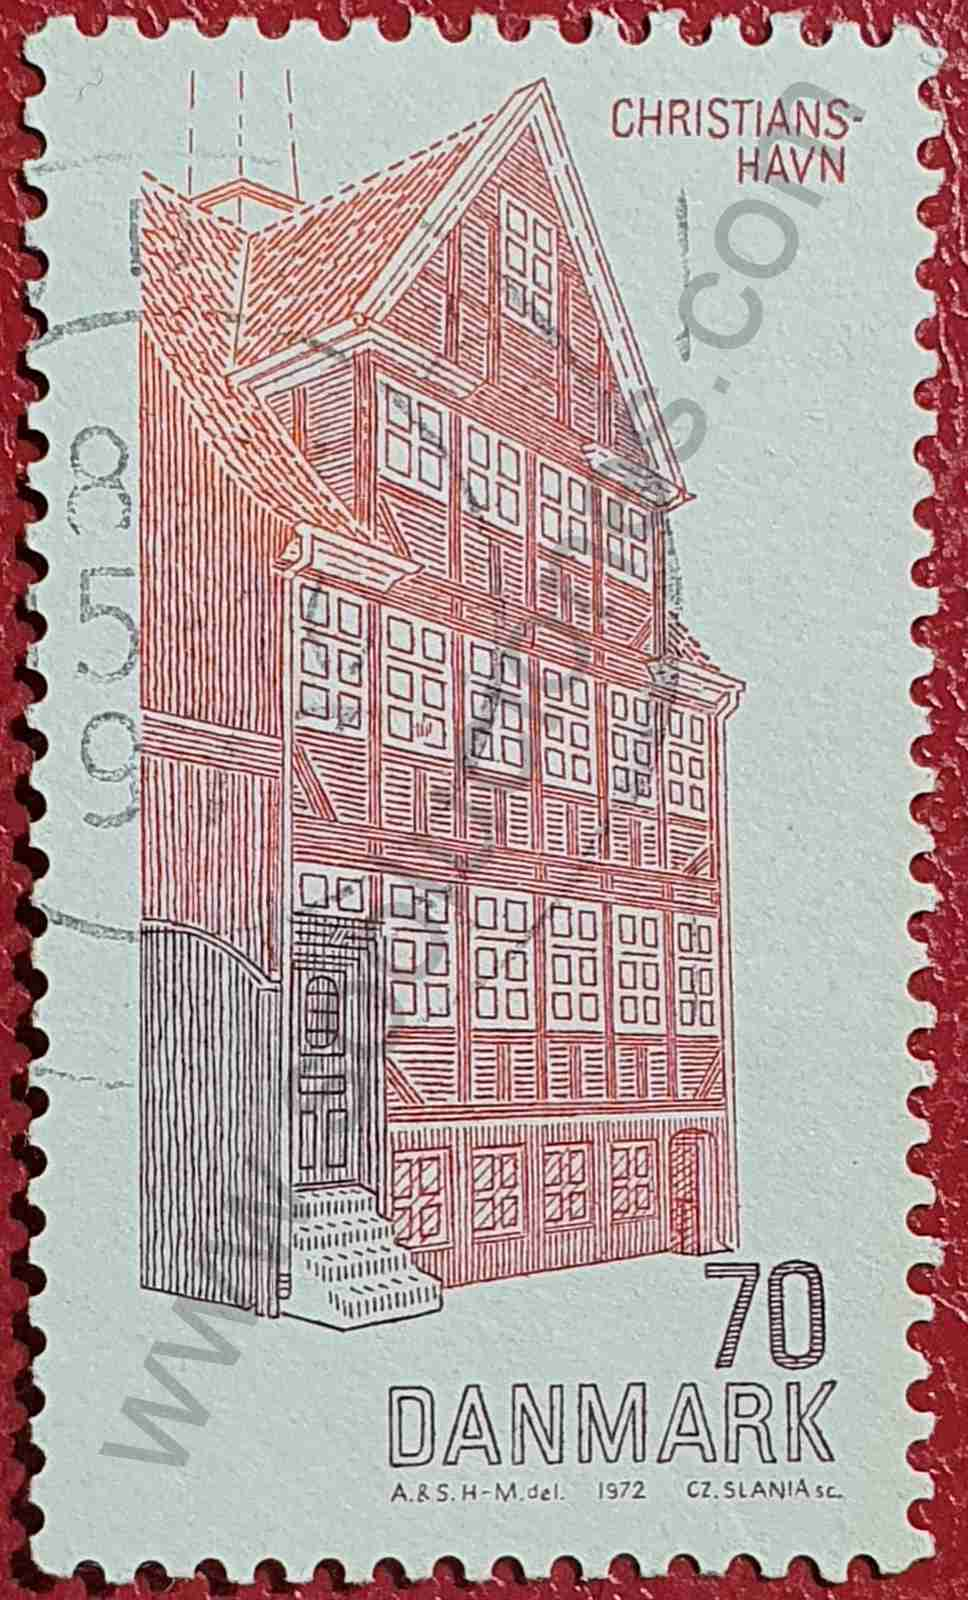 Casa de Christanshavn - Sello de Dinamarca 1972